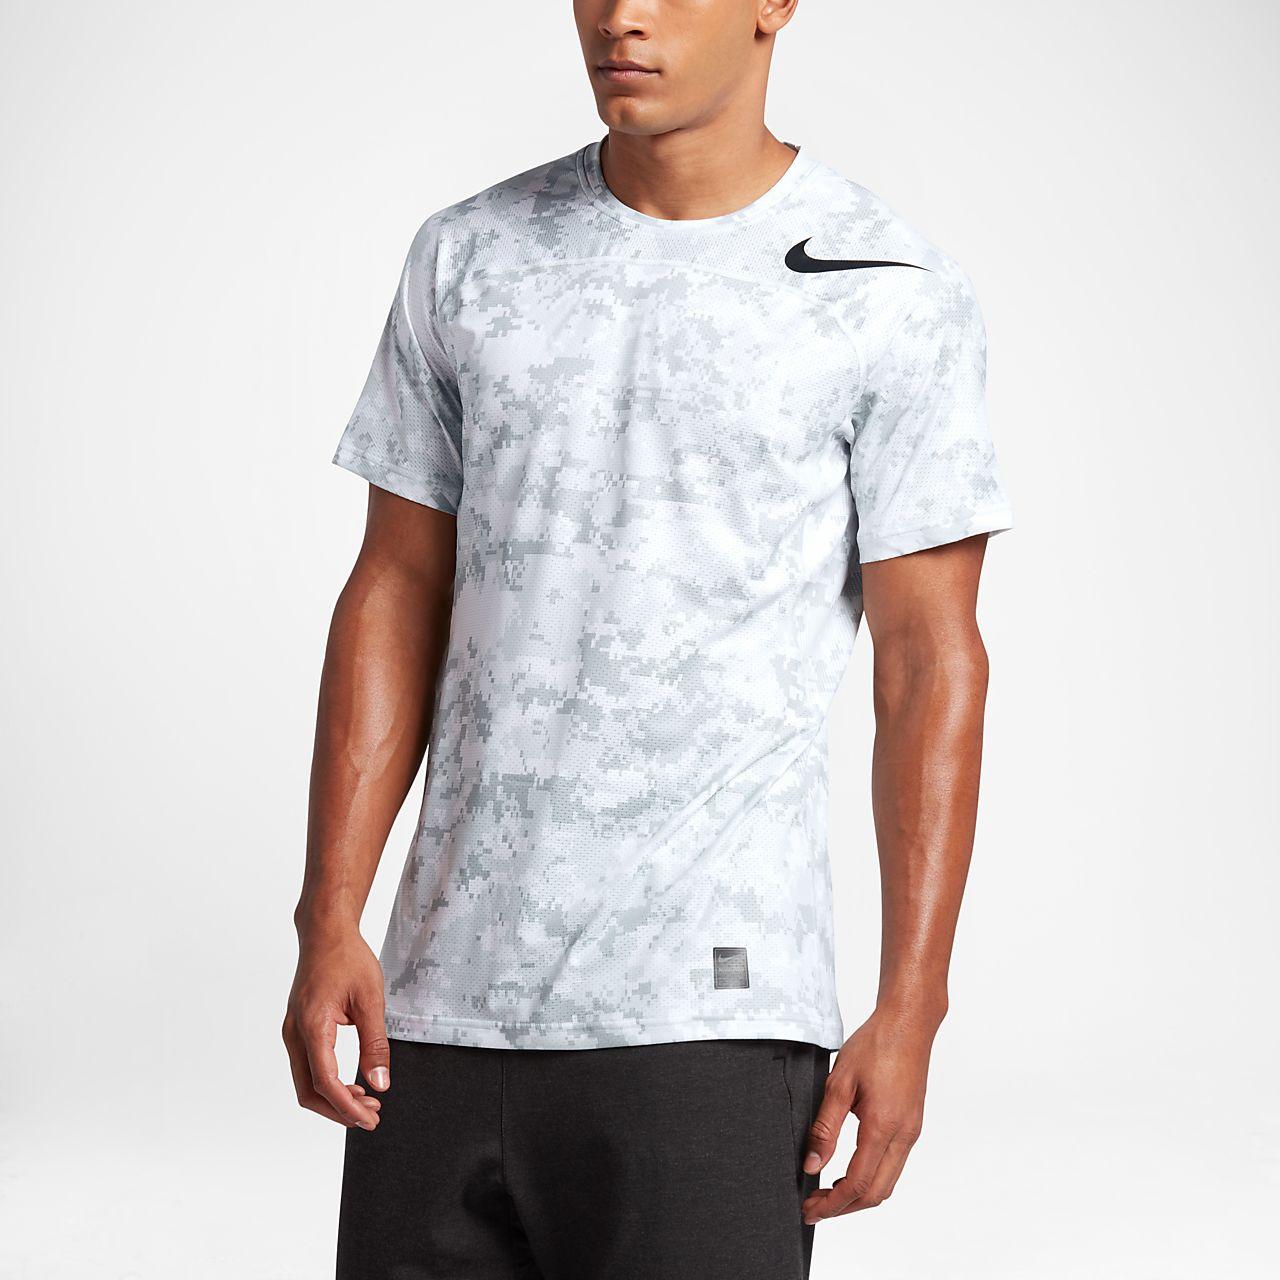 Nike Pro HyperCool Men's Short Sleeve Training Top White/Platinum/Black